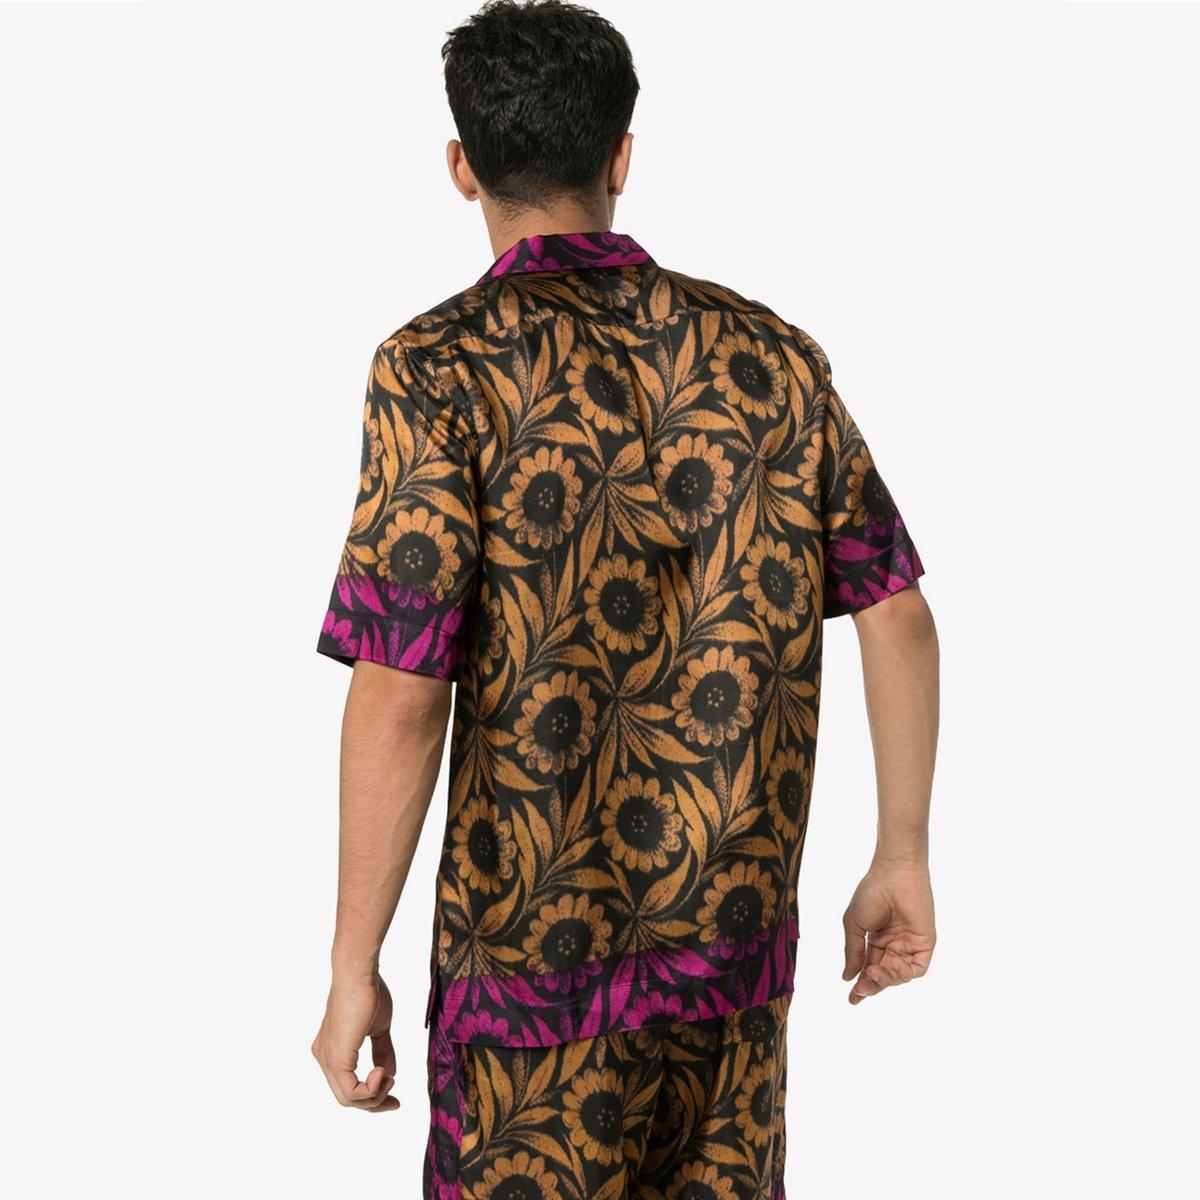 dries-van-noten-carlton-printed-shirt_14139289_20088733_1920.jpg